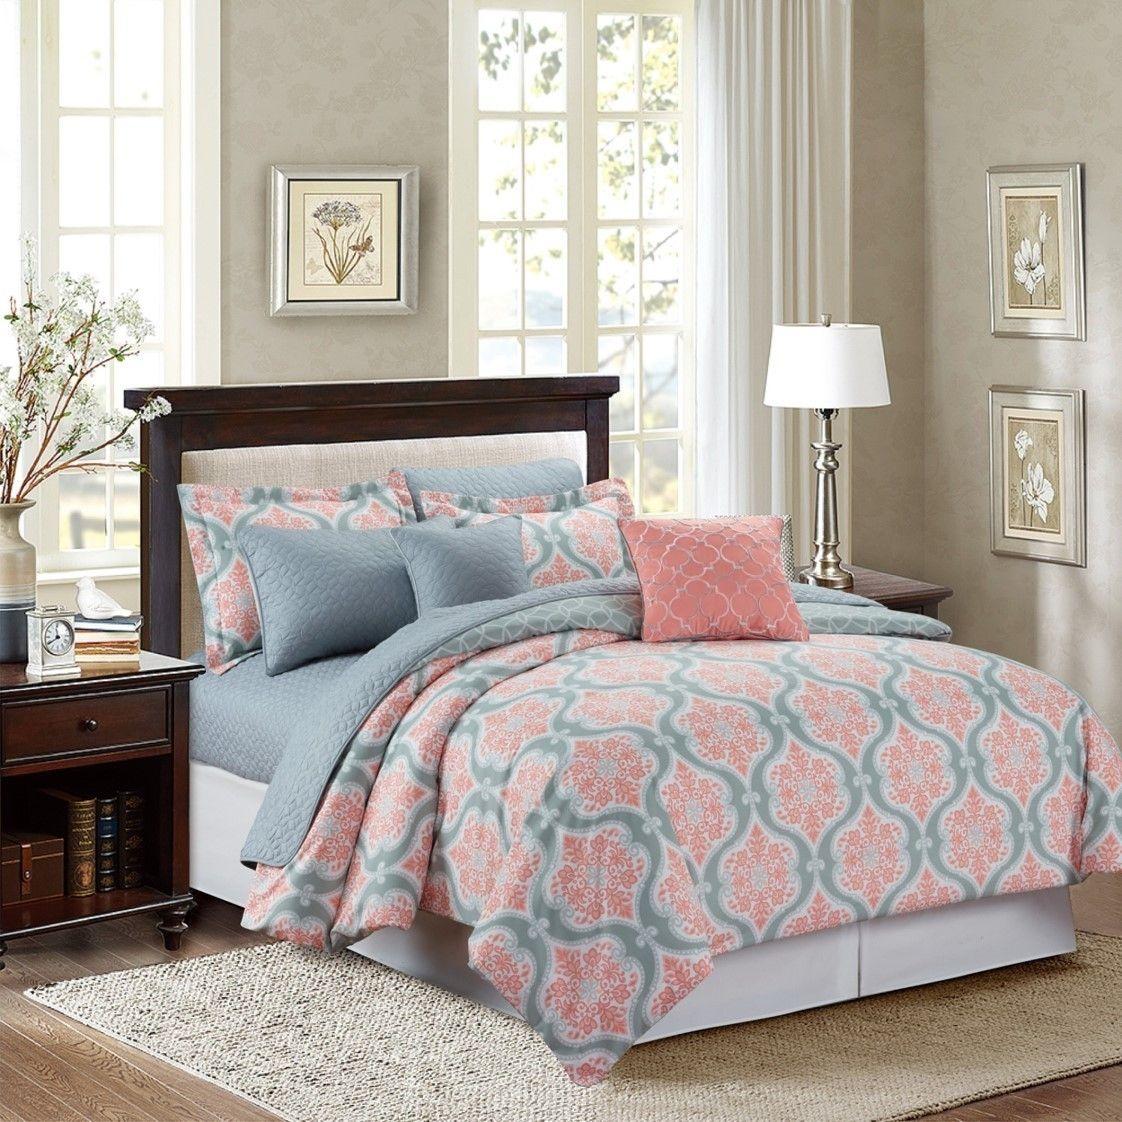 Coral Comforter Set